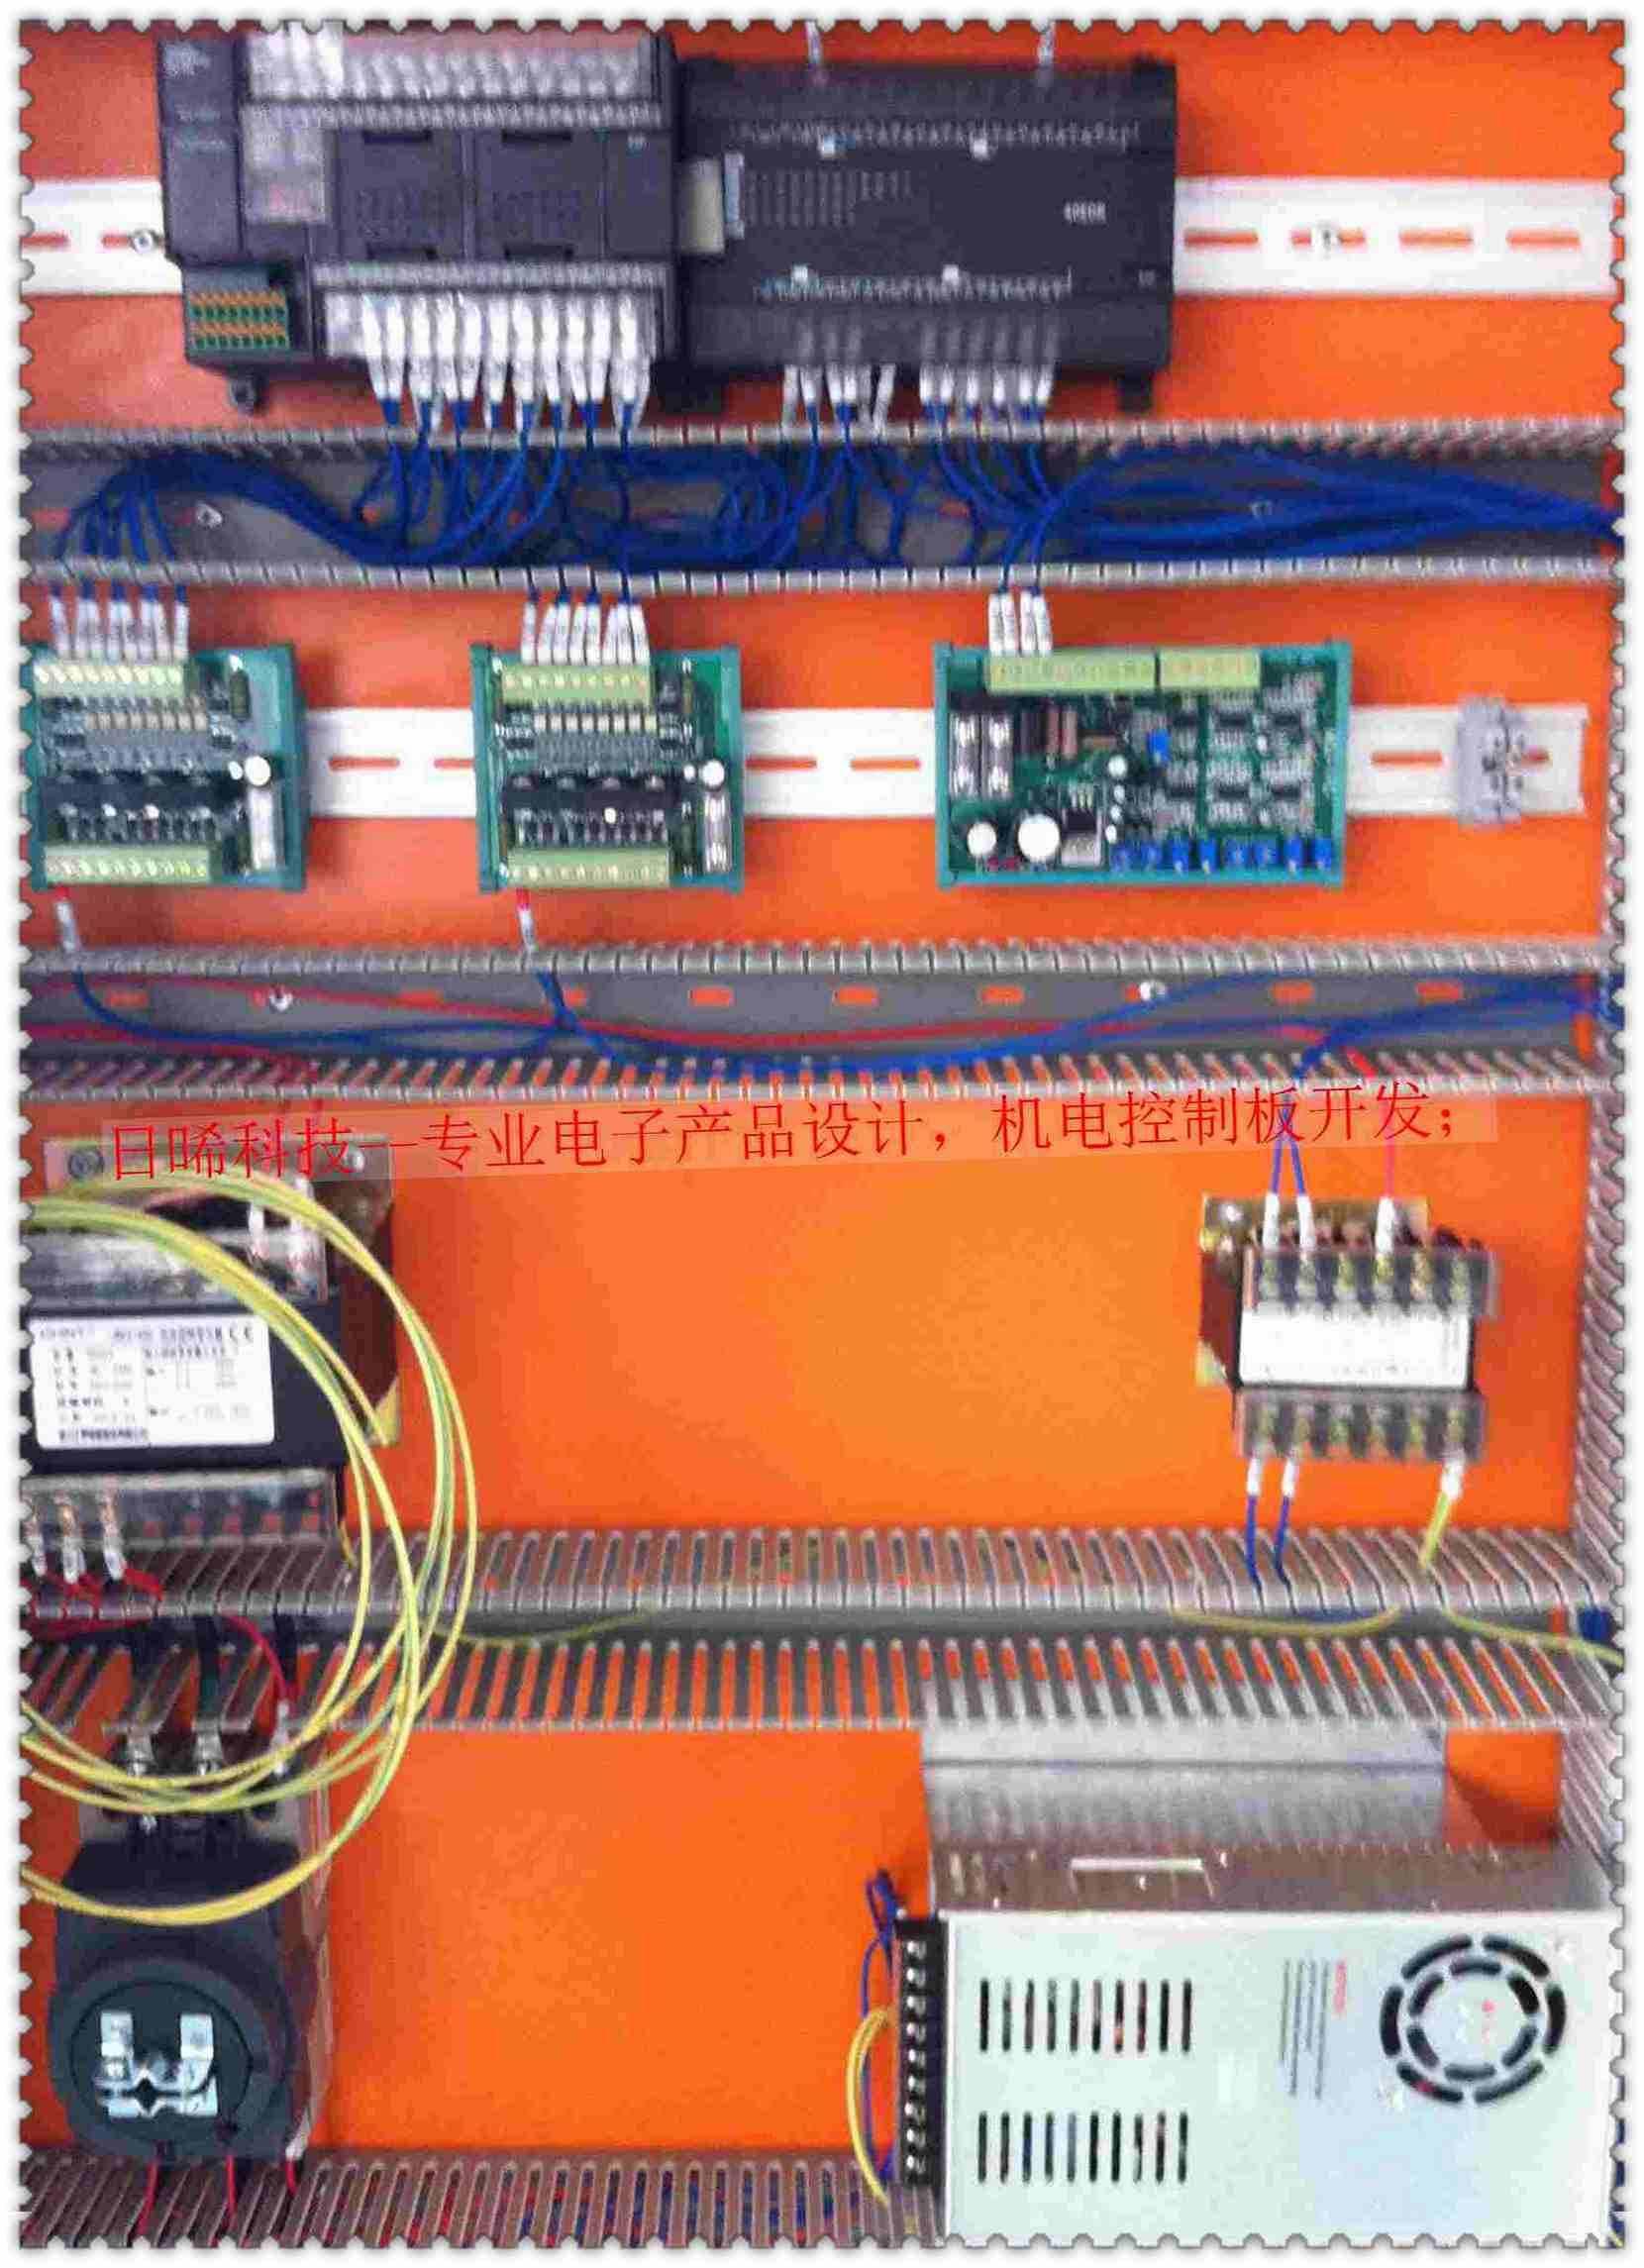 plc自动门直流主电路图